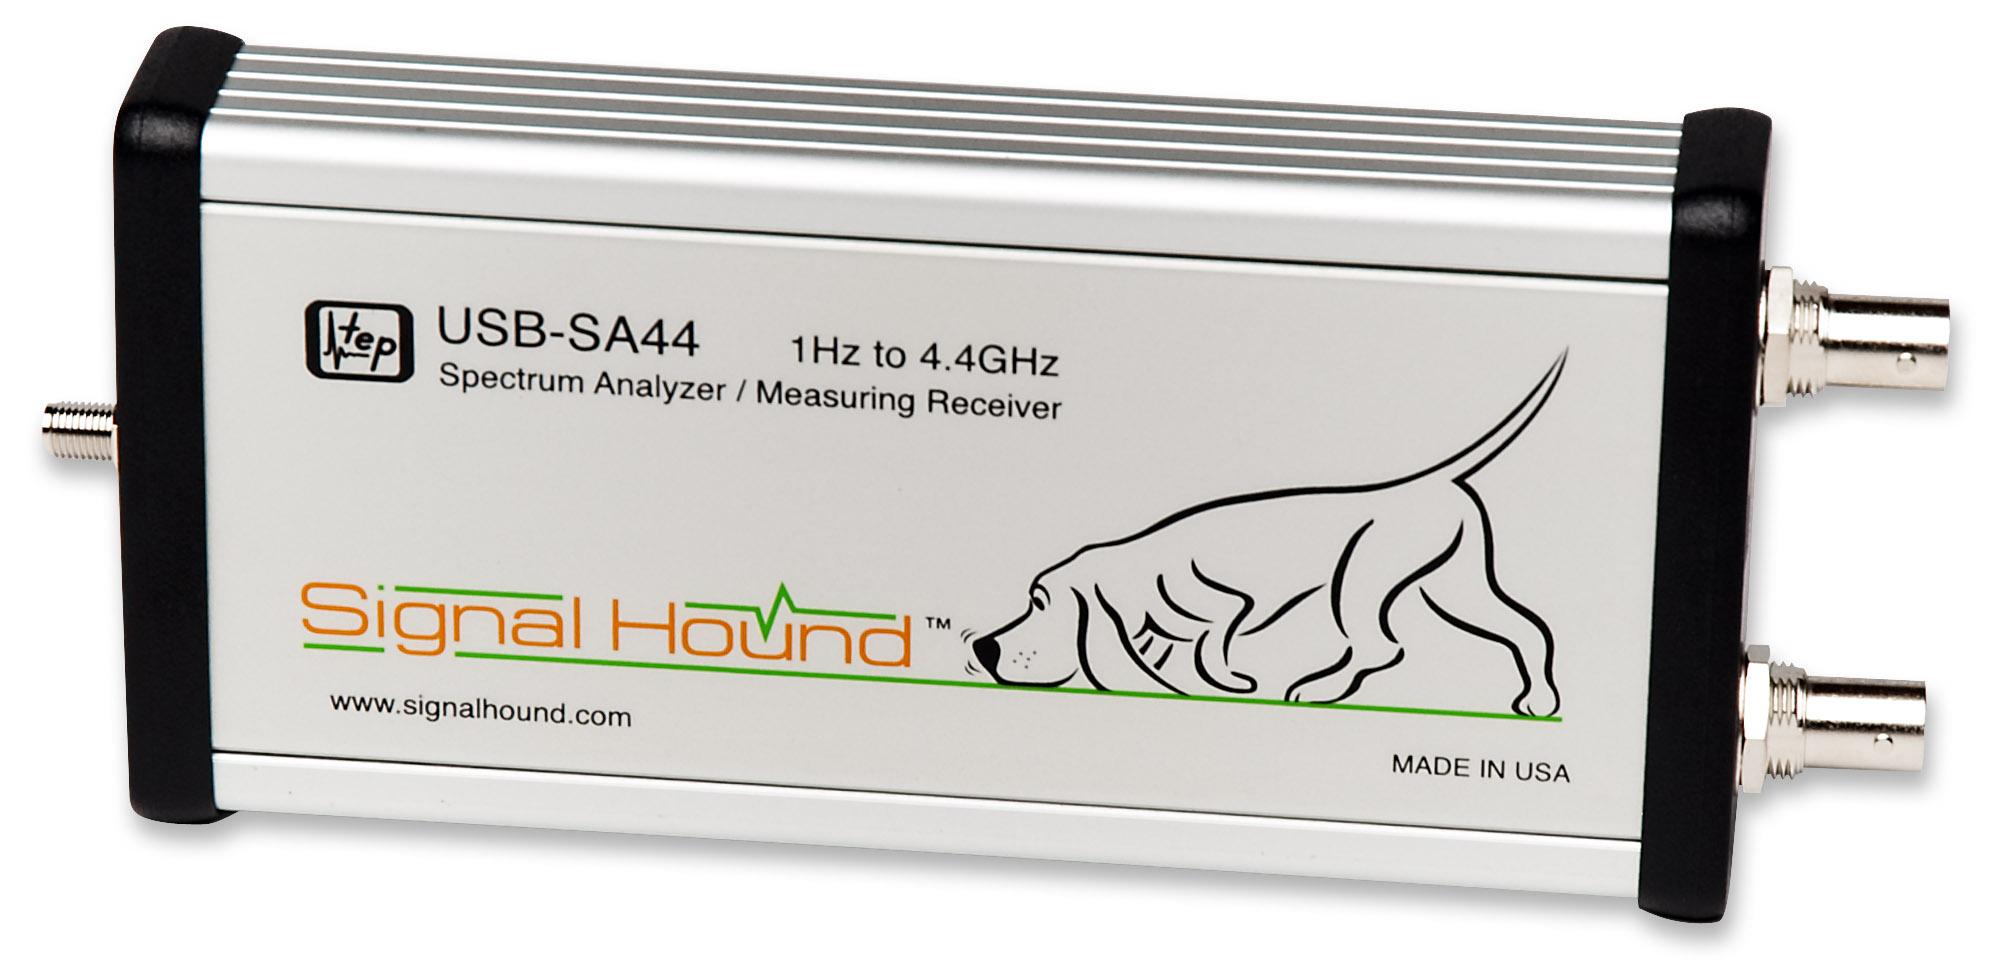 New 4 4 GHz Spectrum Analyzer and Measuring Receiver